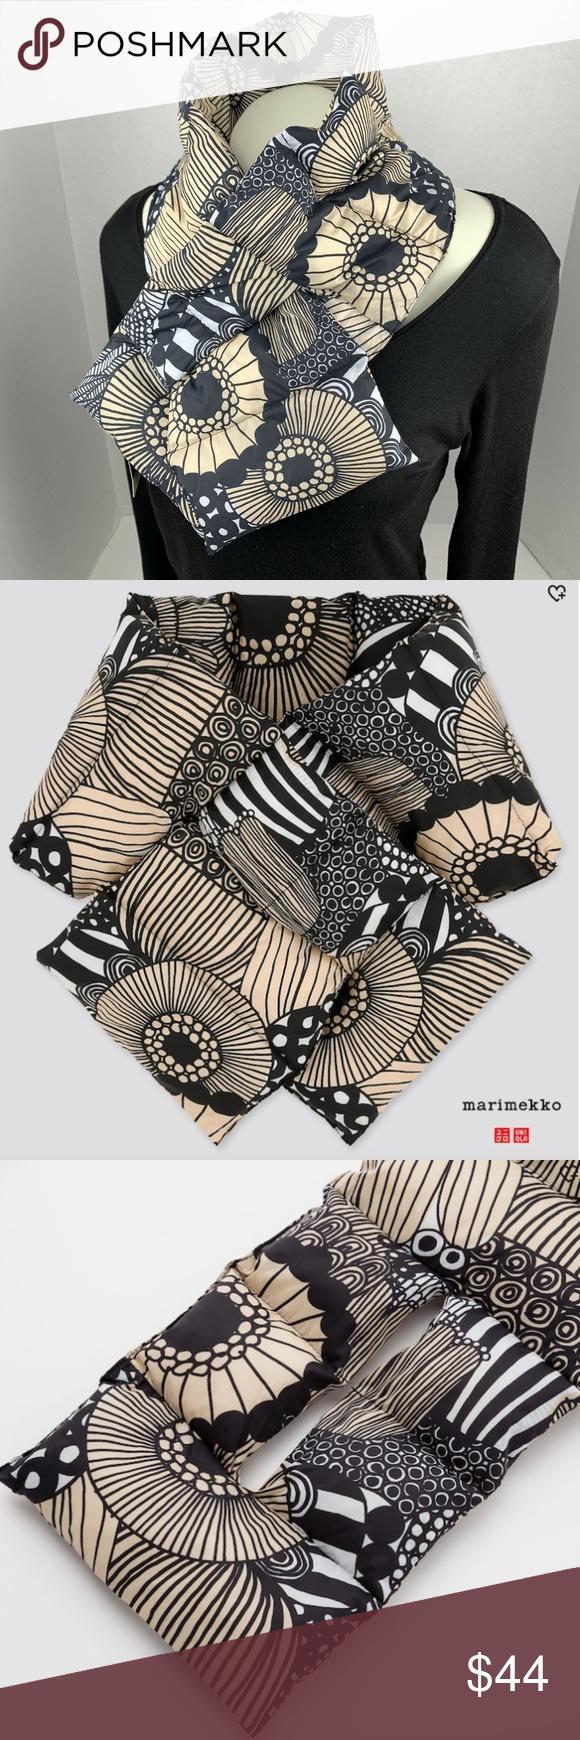 Marimekko x Uniqlo Padded Scarf Black Tan Floral NWT